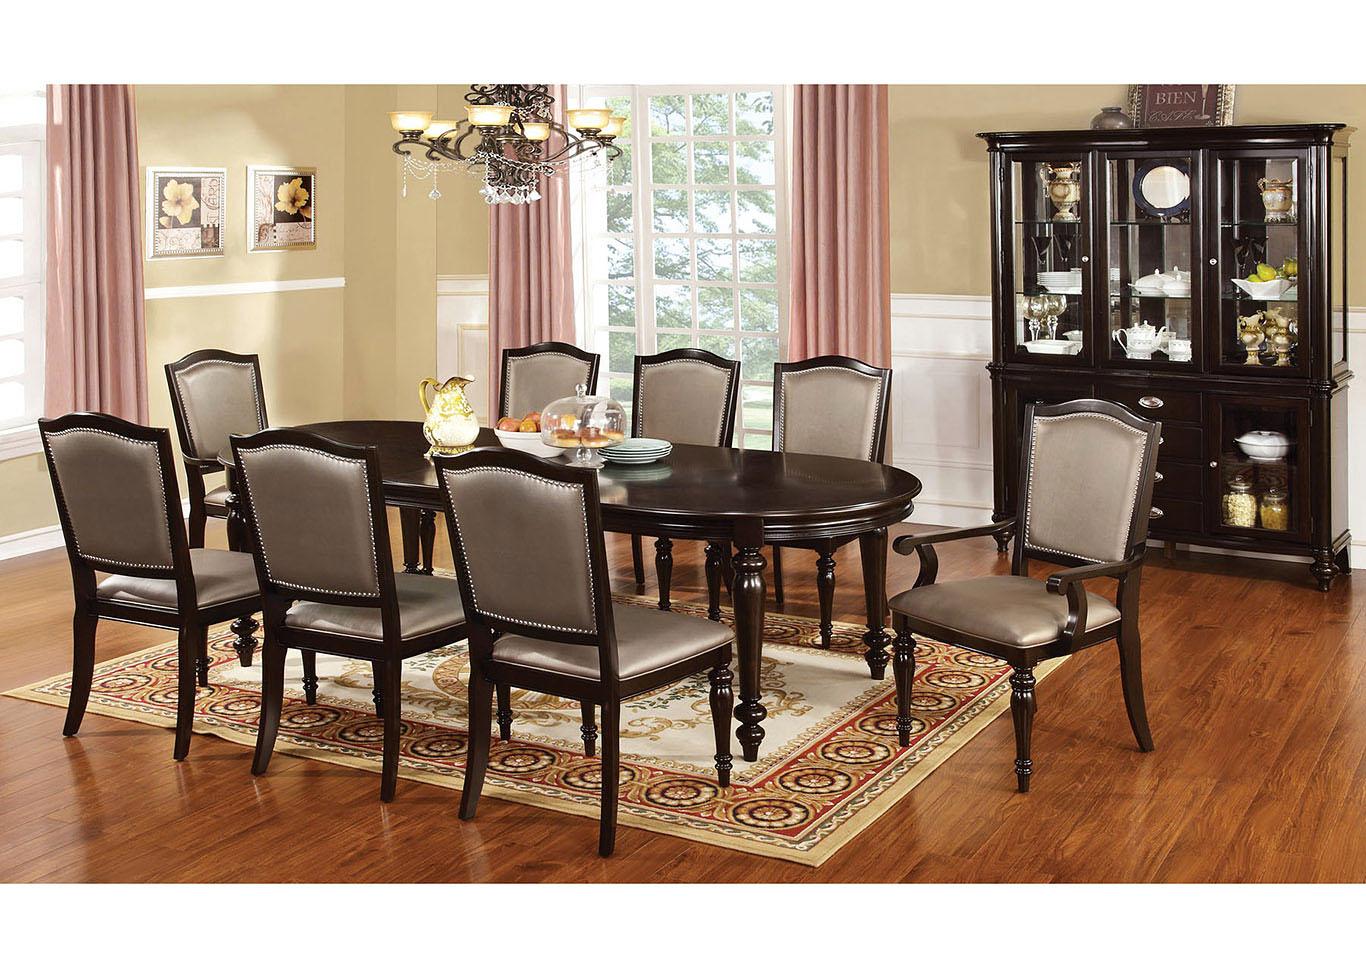 Merveilleux Harrington Dark Walnut Extension Dining Table W/6 Side Chairs U0026 2 Arm  Chairs,